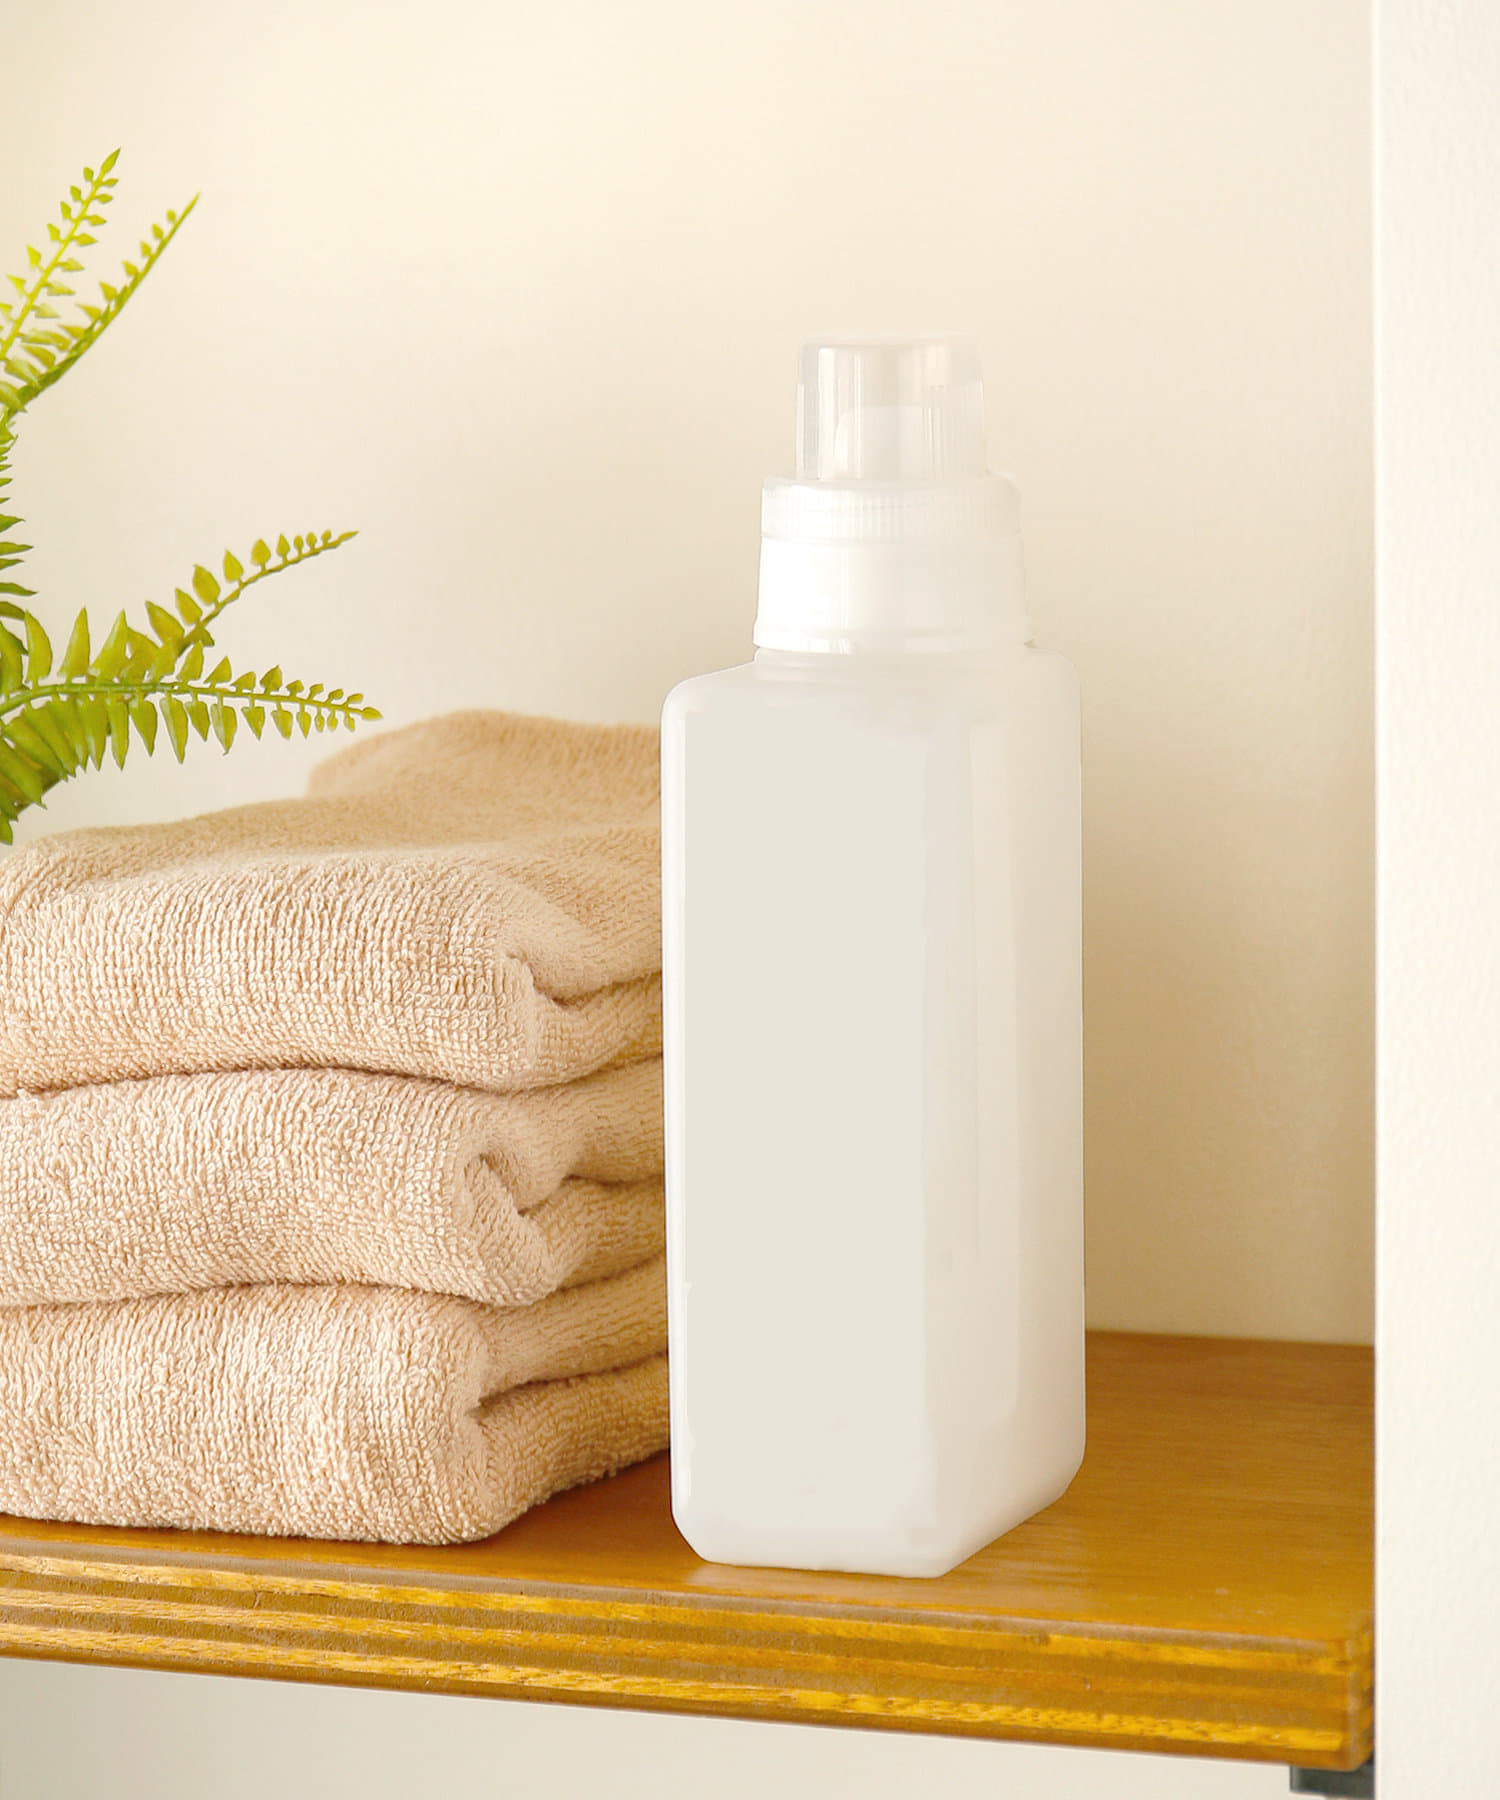 3COINS(スリーコインズ) ライフスタイル 洗剤ボトル:500ml ホワイト